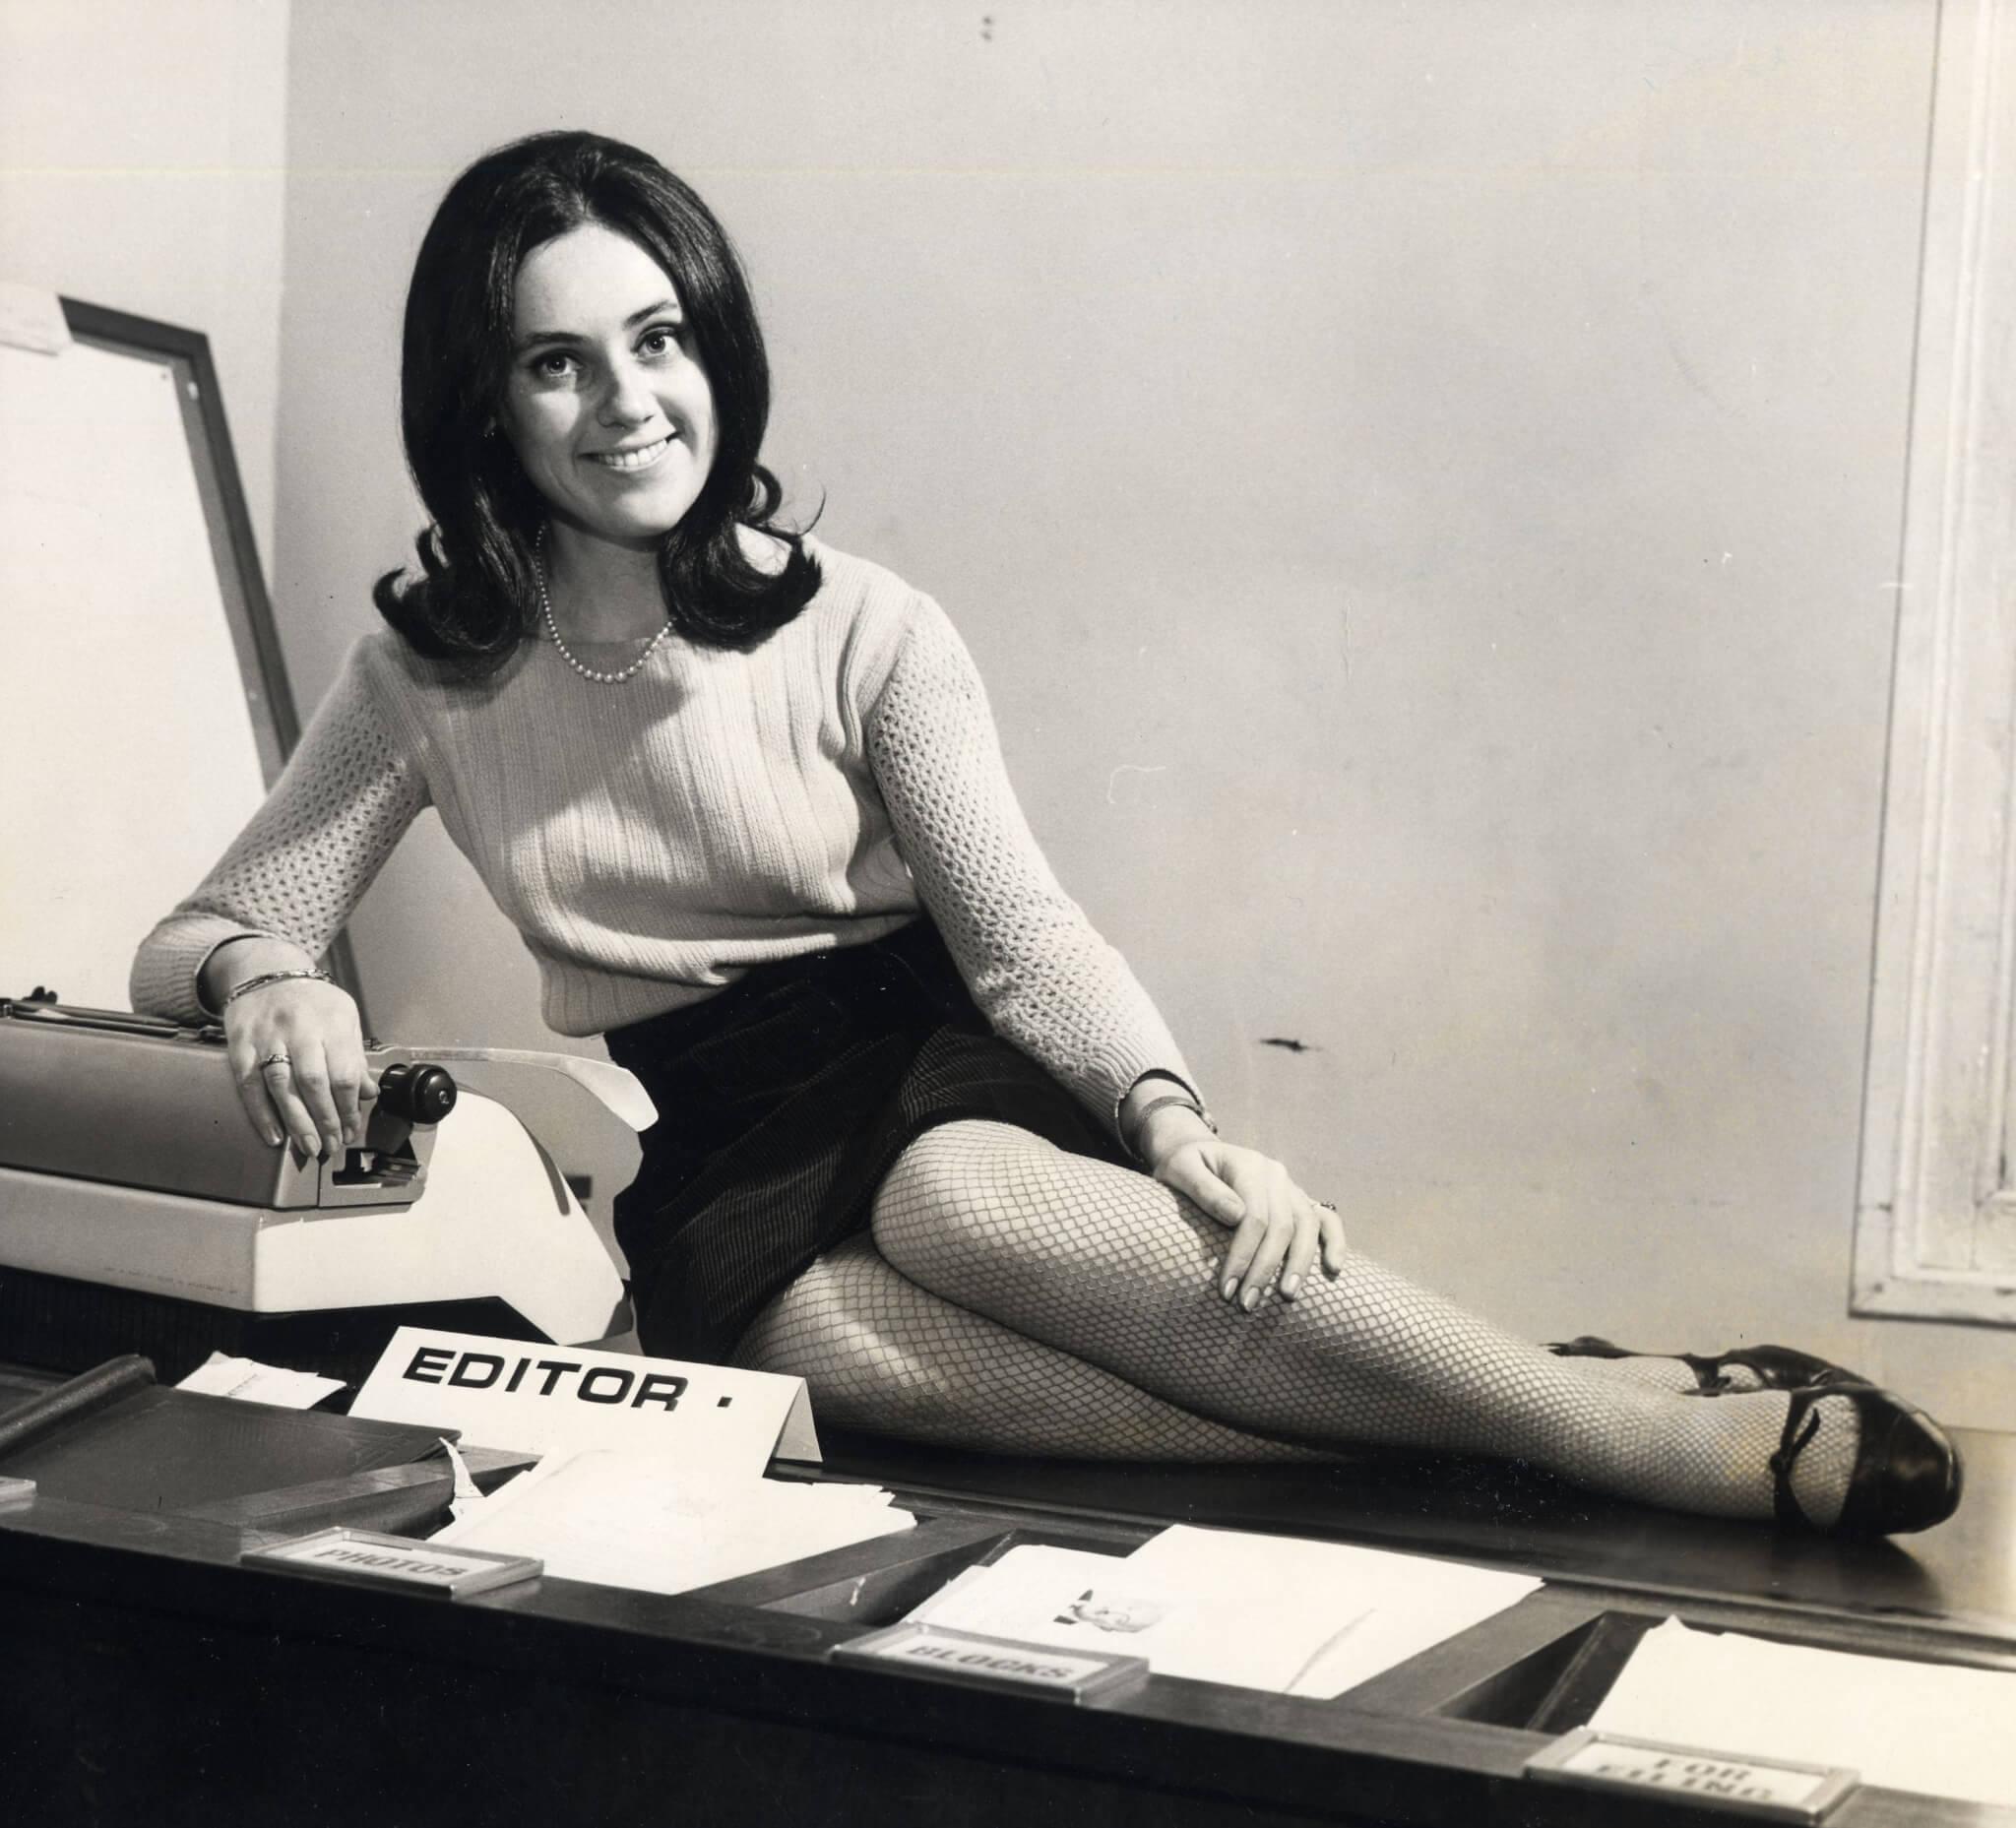 Suzy Menkes曾先後在《泰晤士報》、《紐約時報》時裝版等媒體工作,執筆寫時裝超過半世紀。